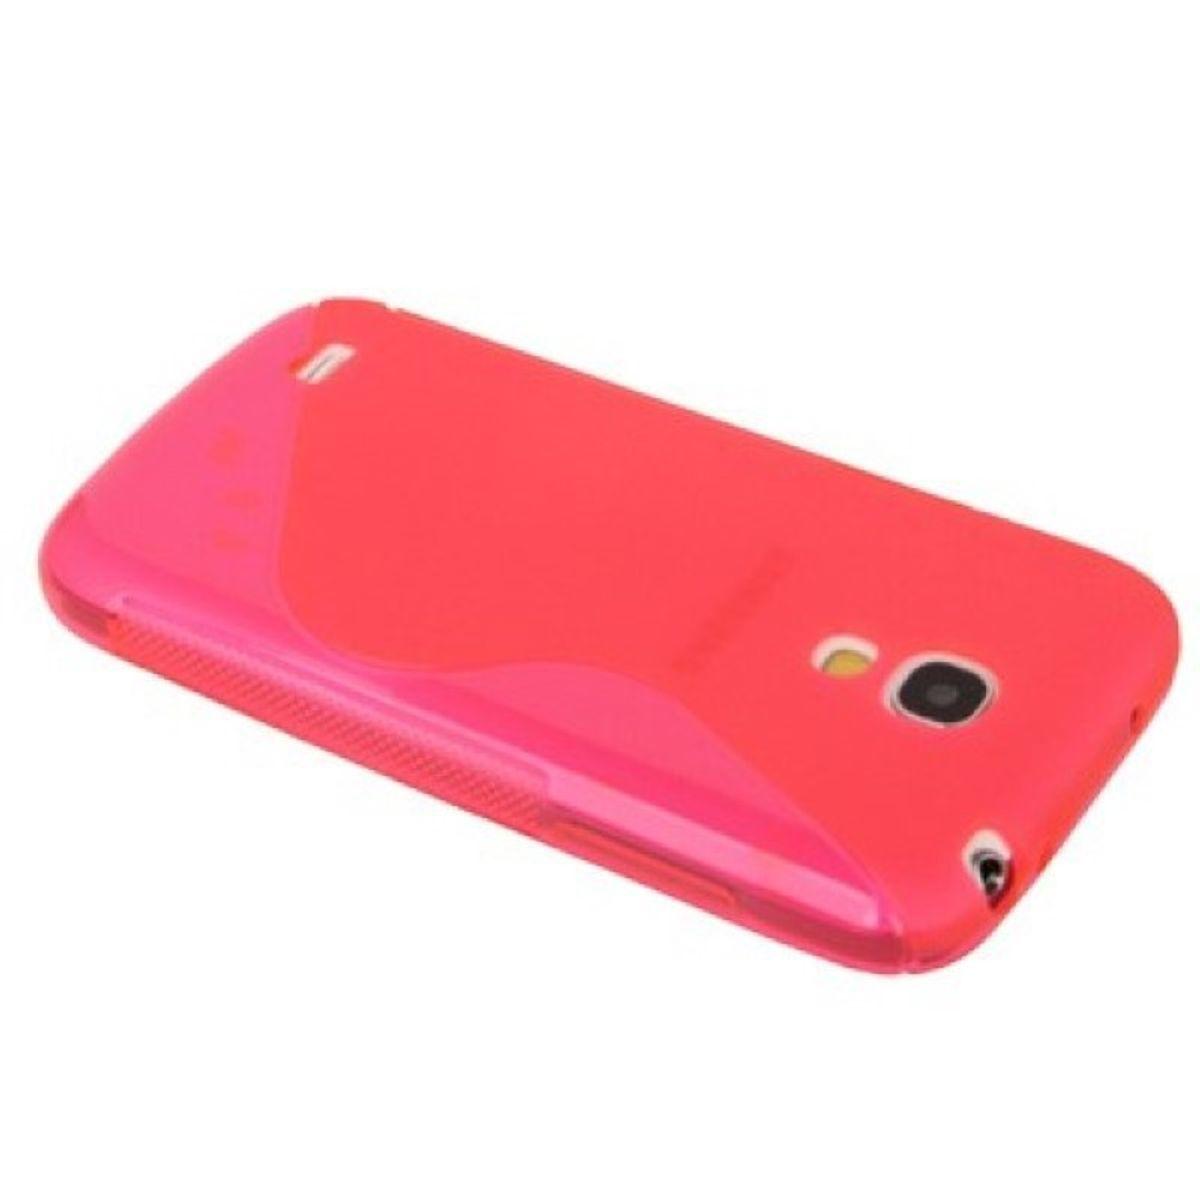 Schutzhülle S - Curve TPU Case für Handy Samsung Galaxy S4 mini i9190 Transparent Pink